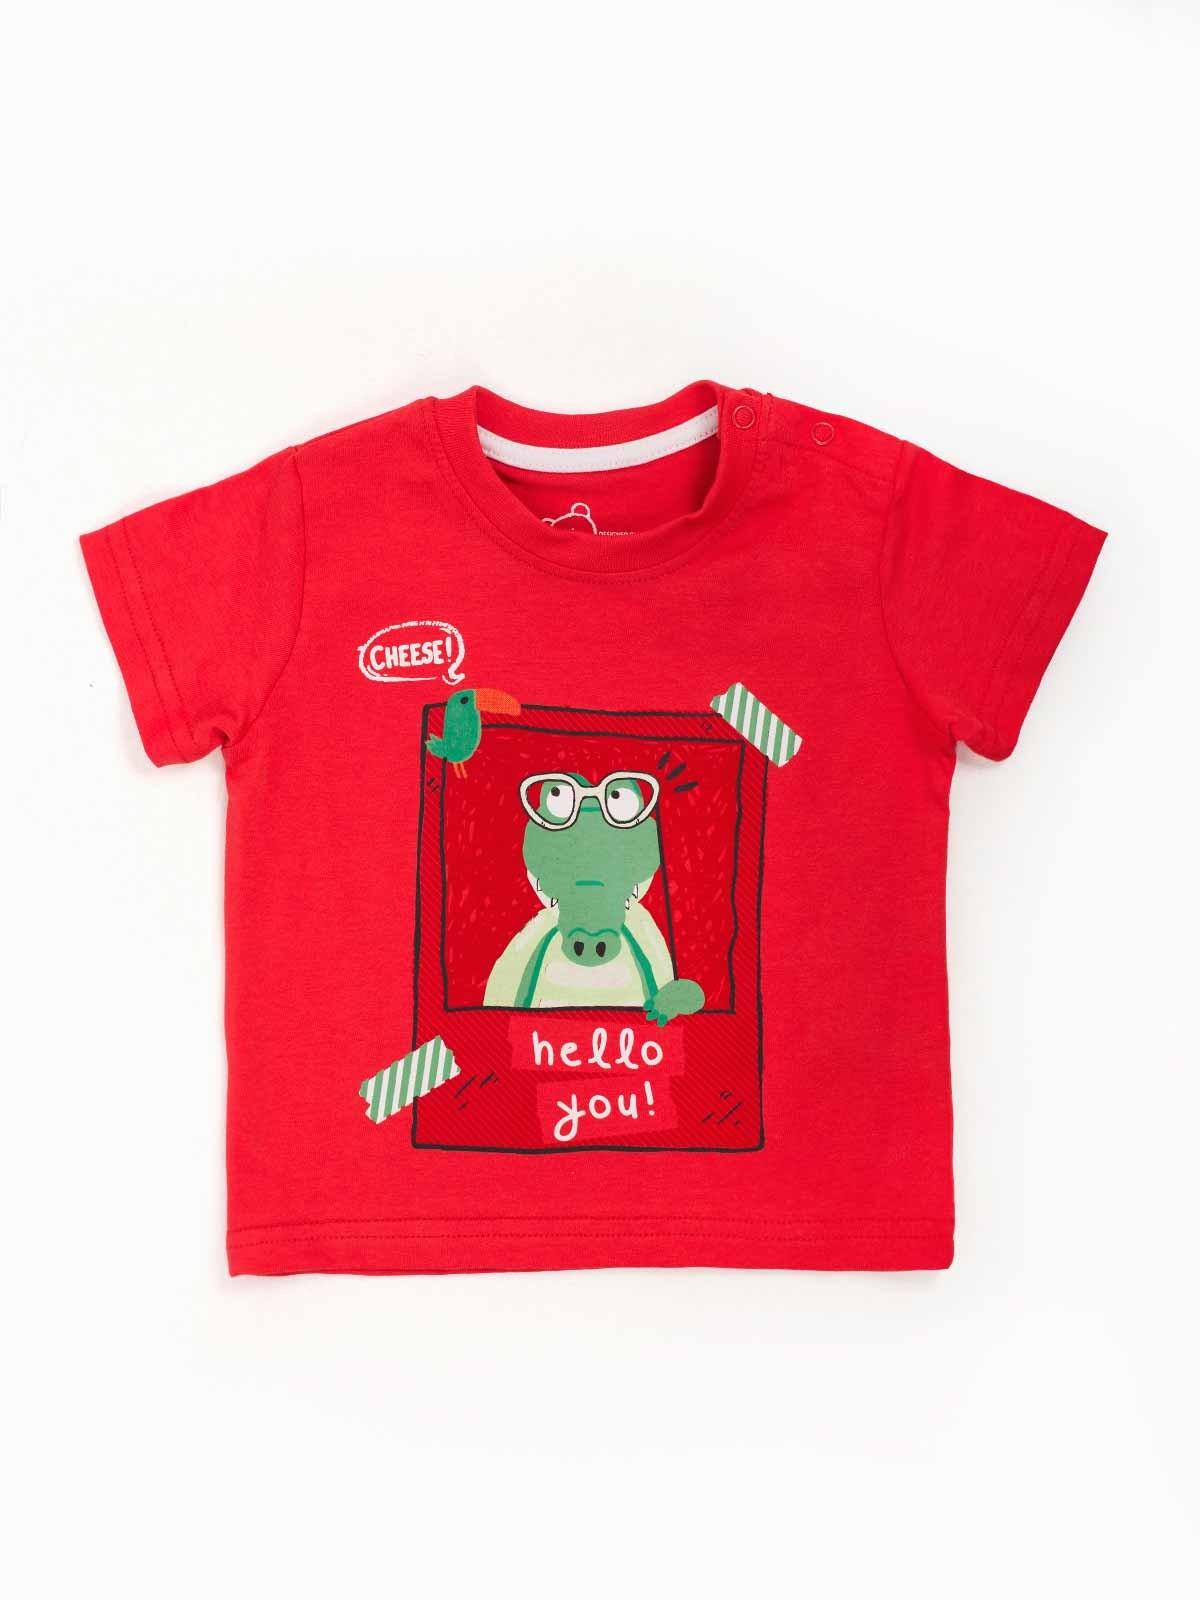 T-shirt bebé Hello You